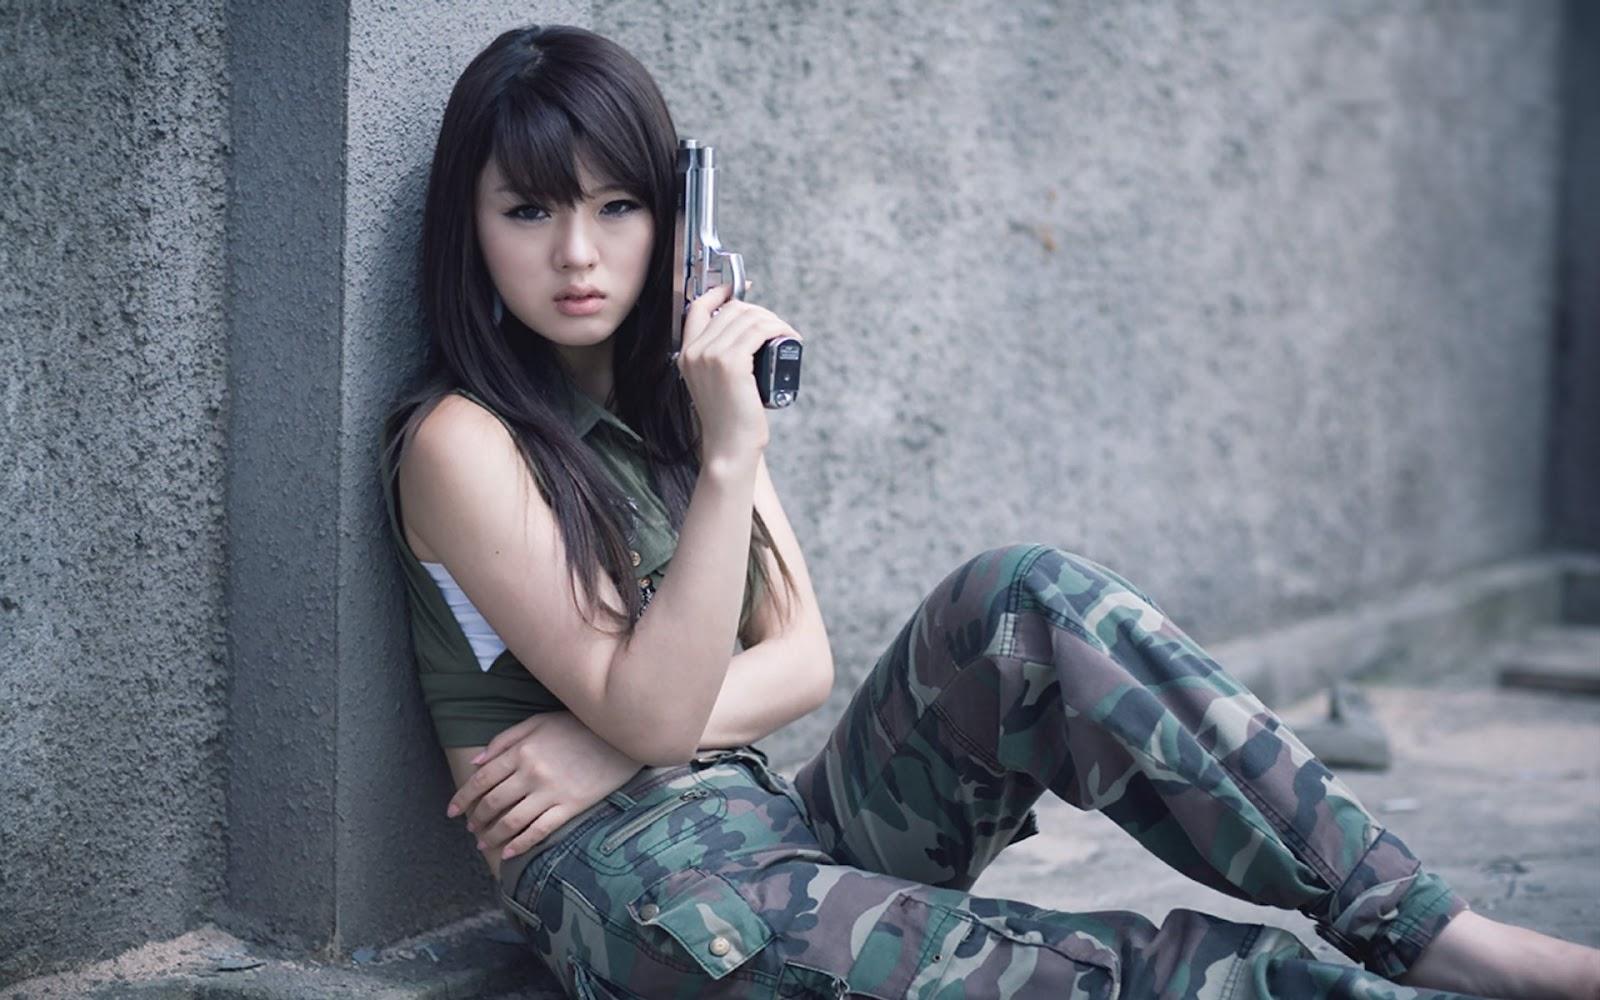 desktop wallpaper  cute hwang mi hee with gun desktop wallpaper